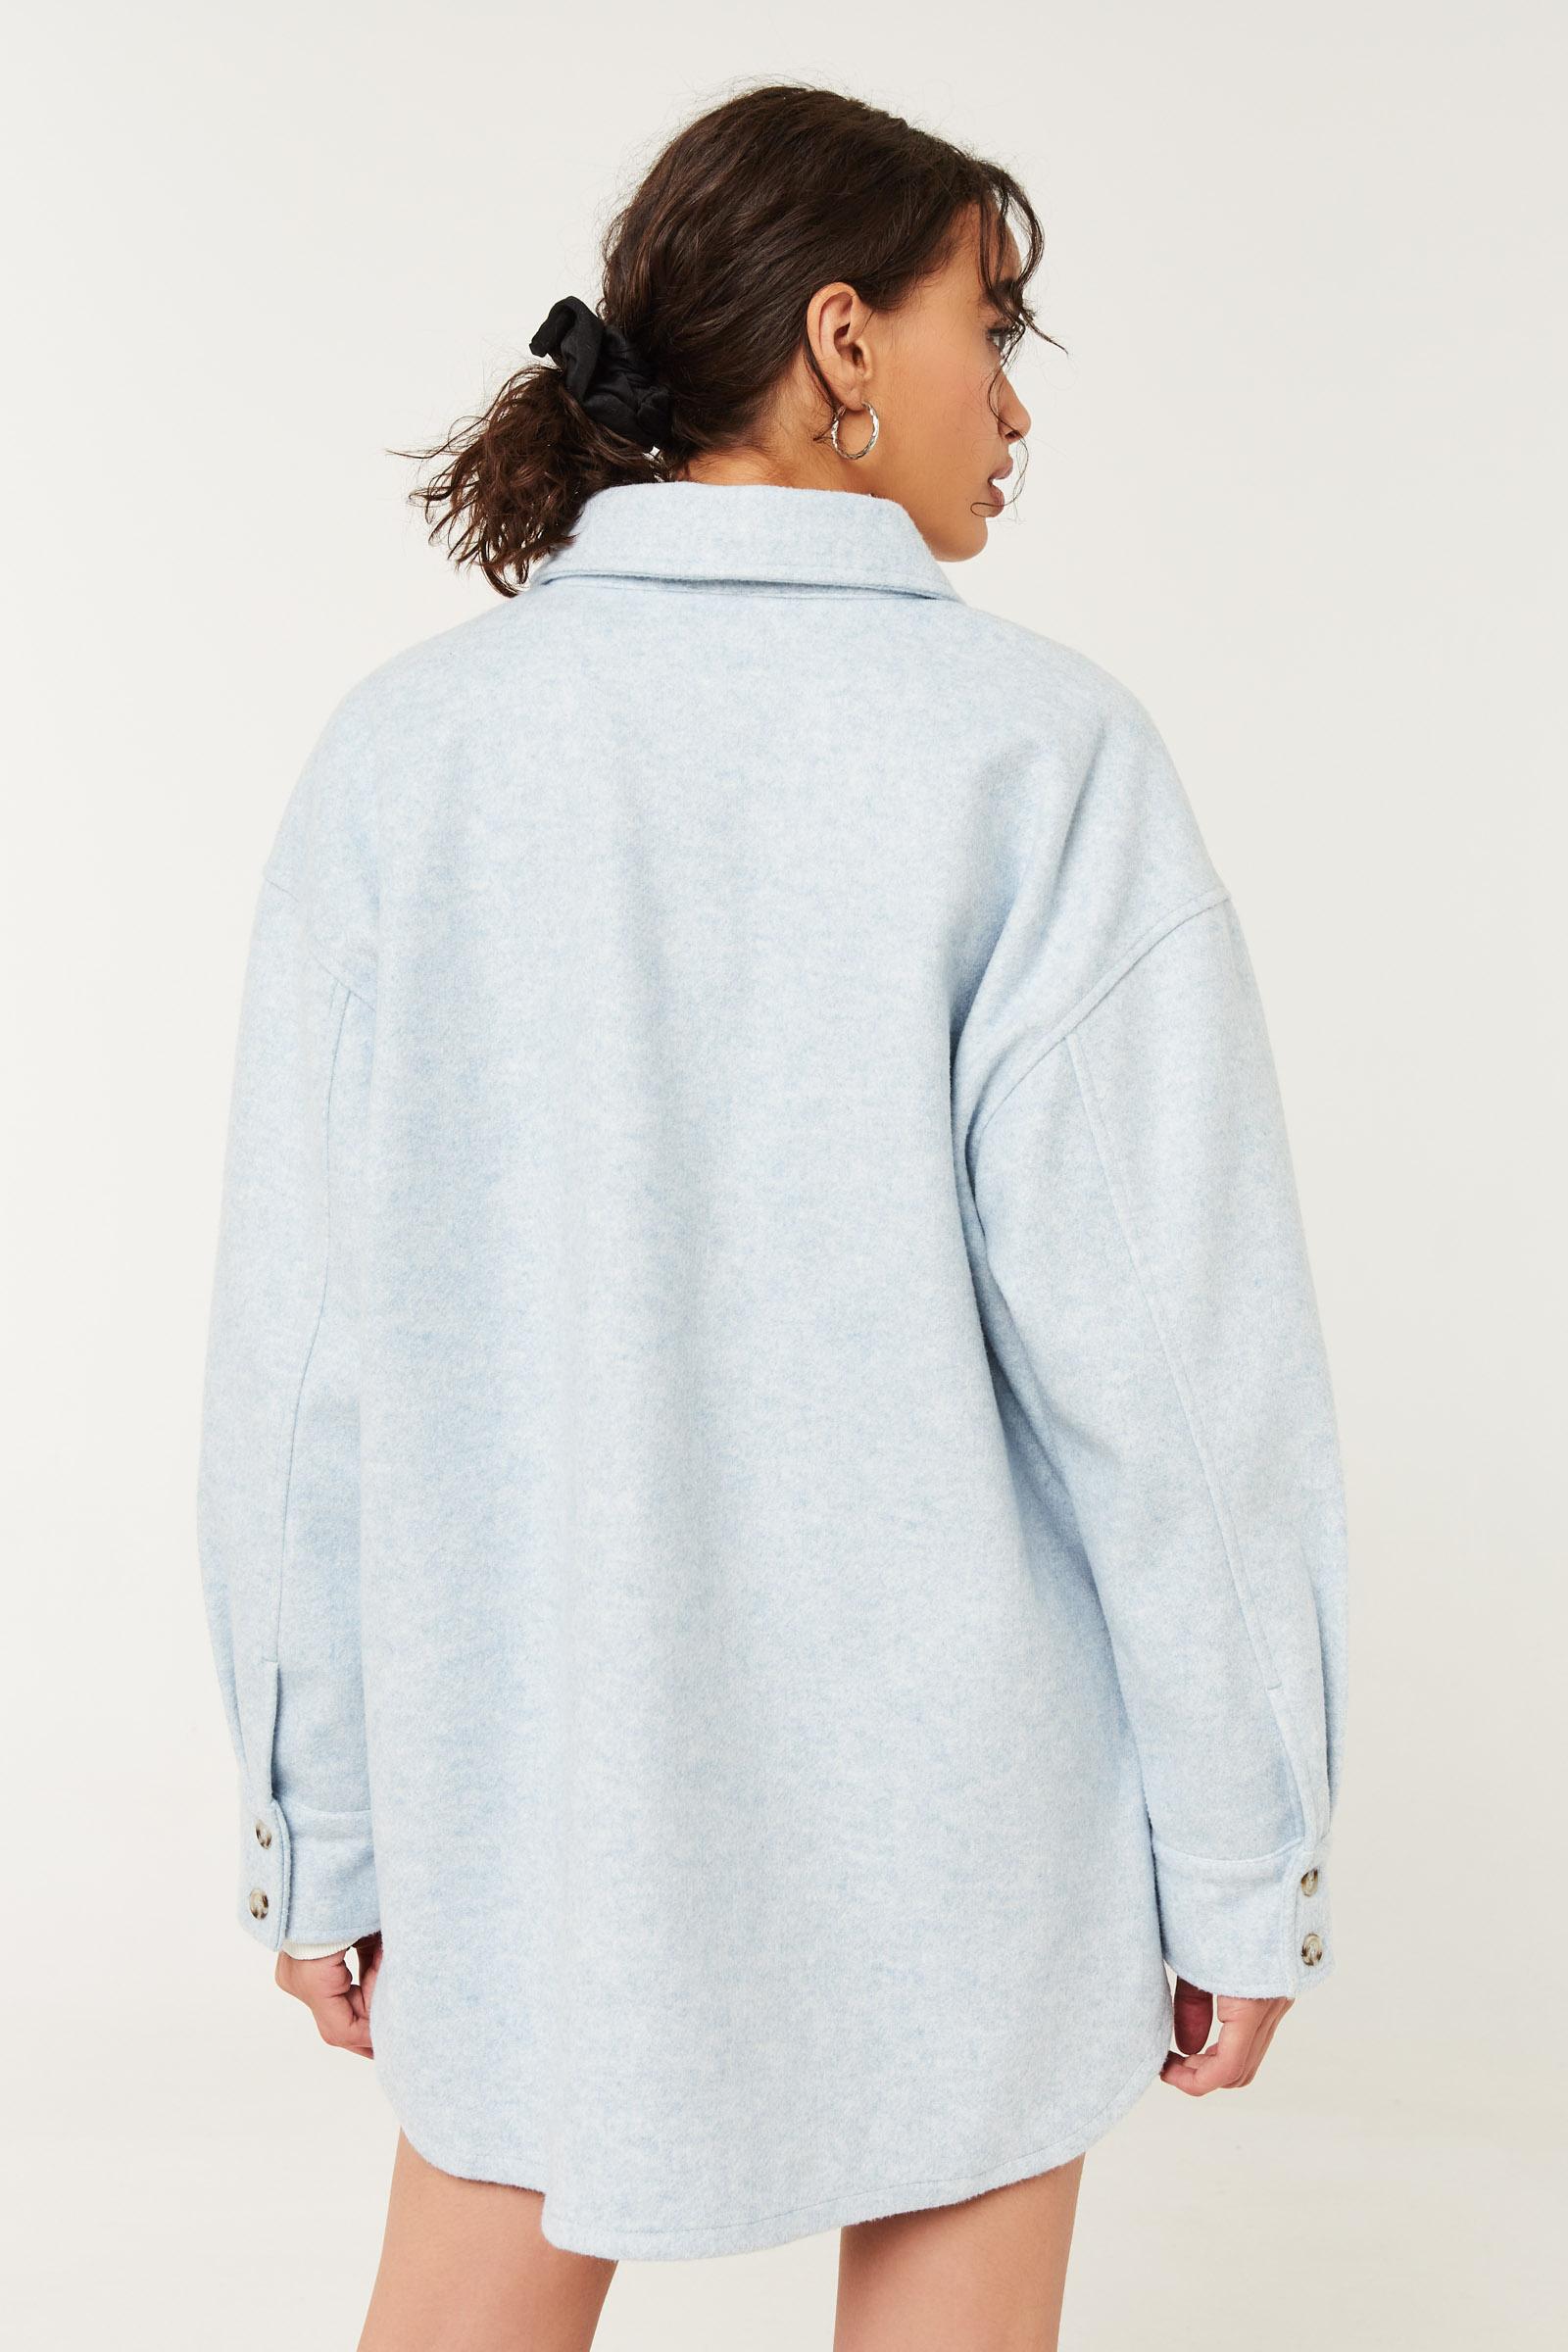 Veste-chemise ample